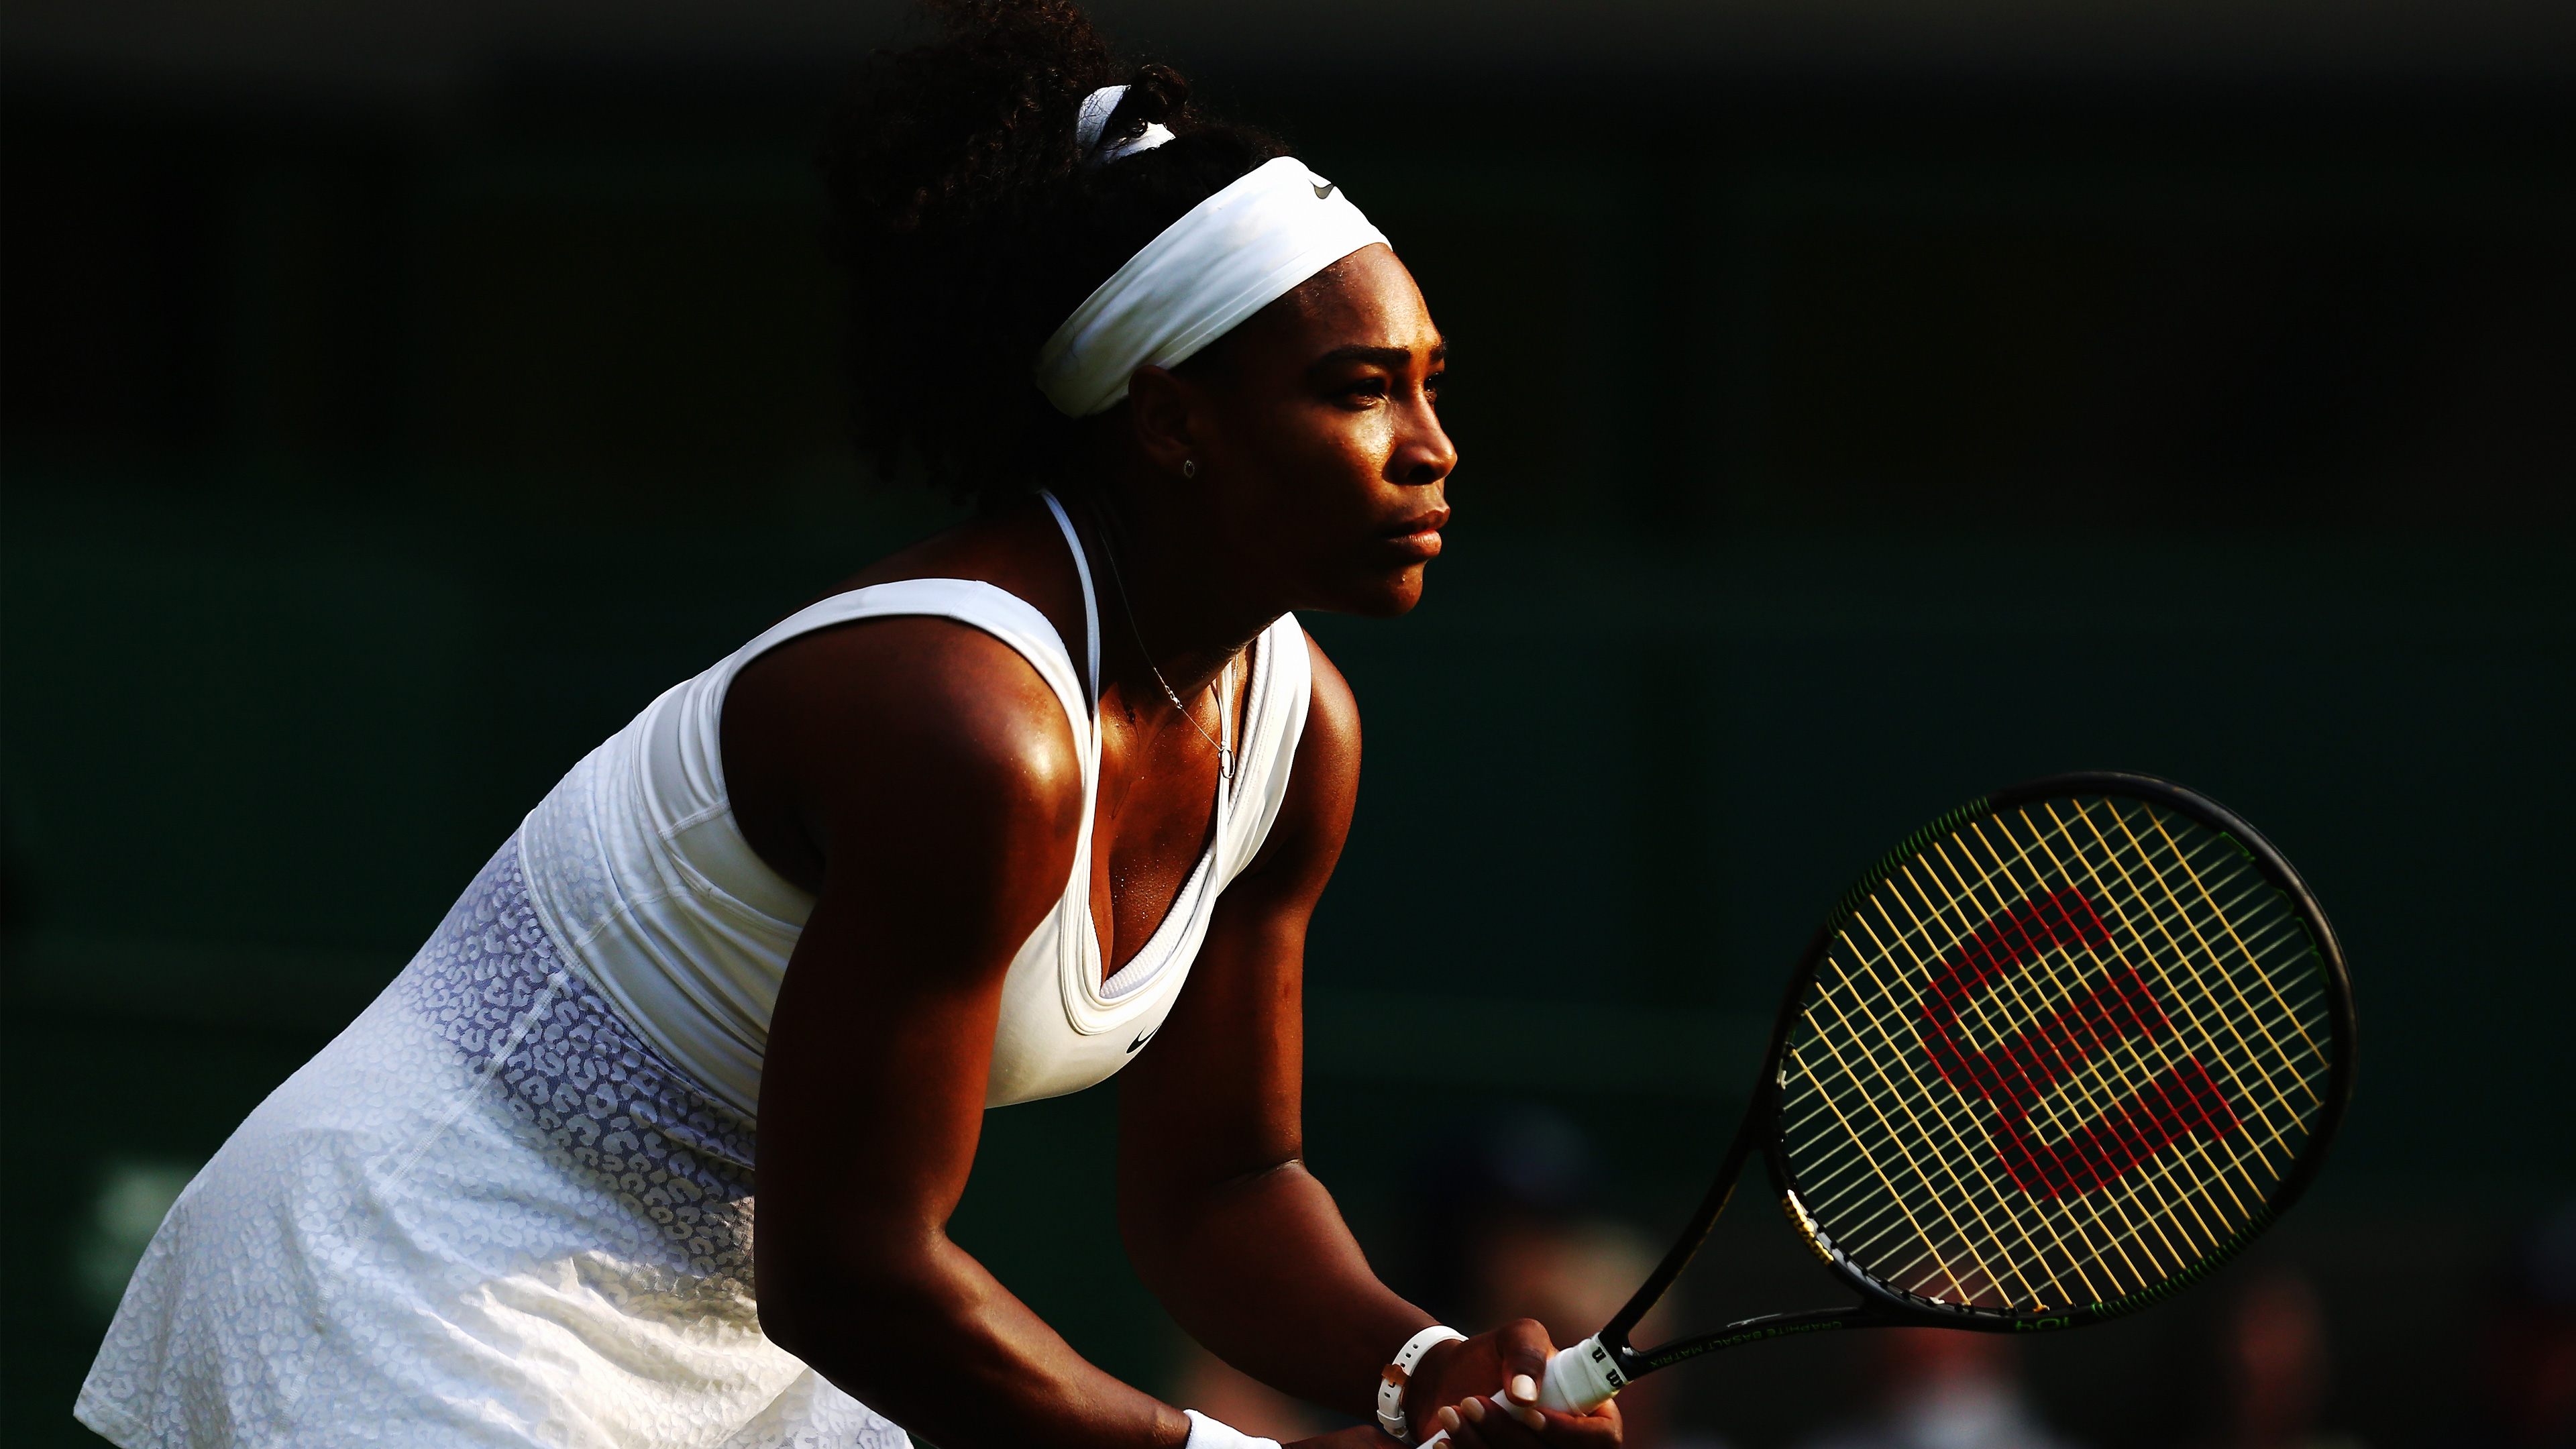 Serena Williams Wallpaper 2   3840 X 2160 stmednet 3840x2160